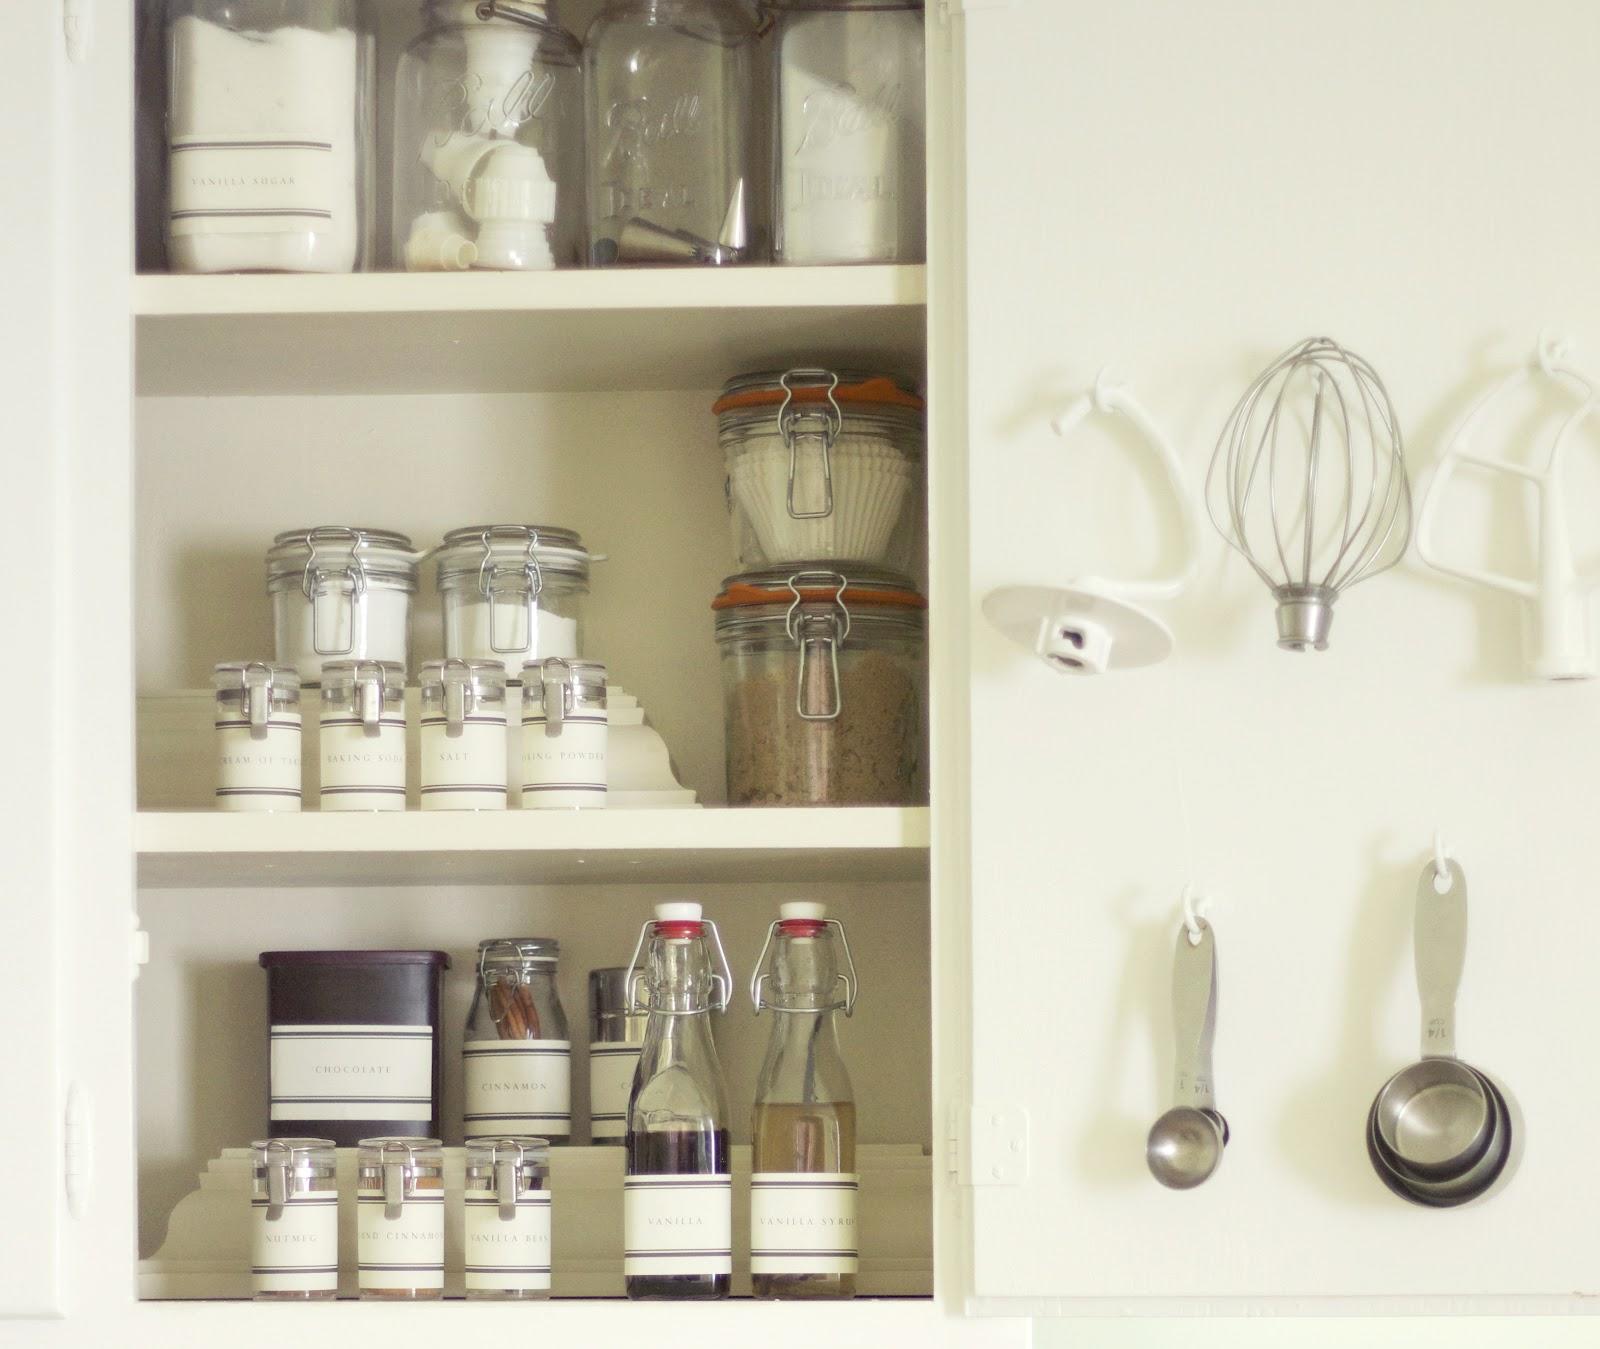 Kichen Organization: Jenny Steffens Hobick: Baking Pantry In A Cabinet